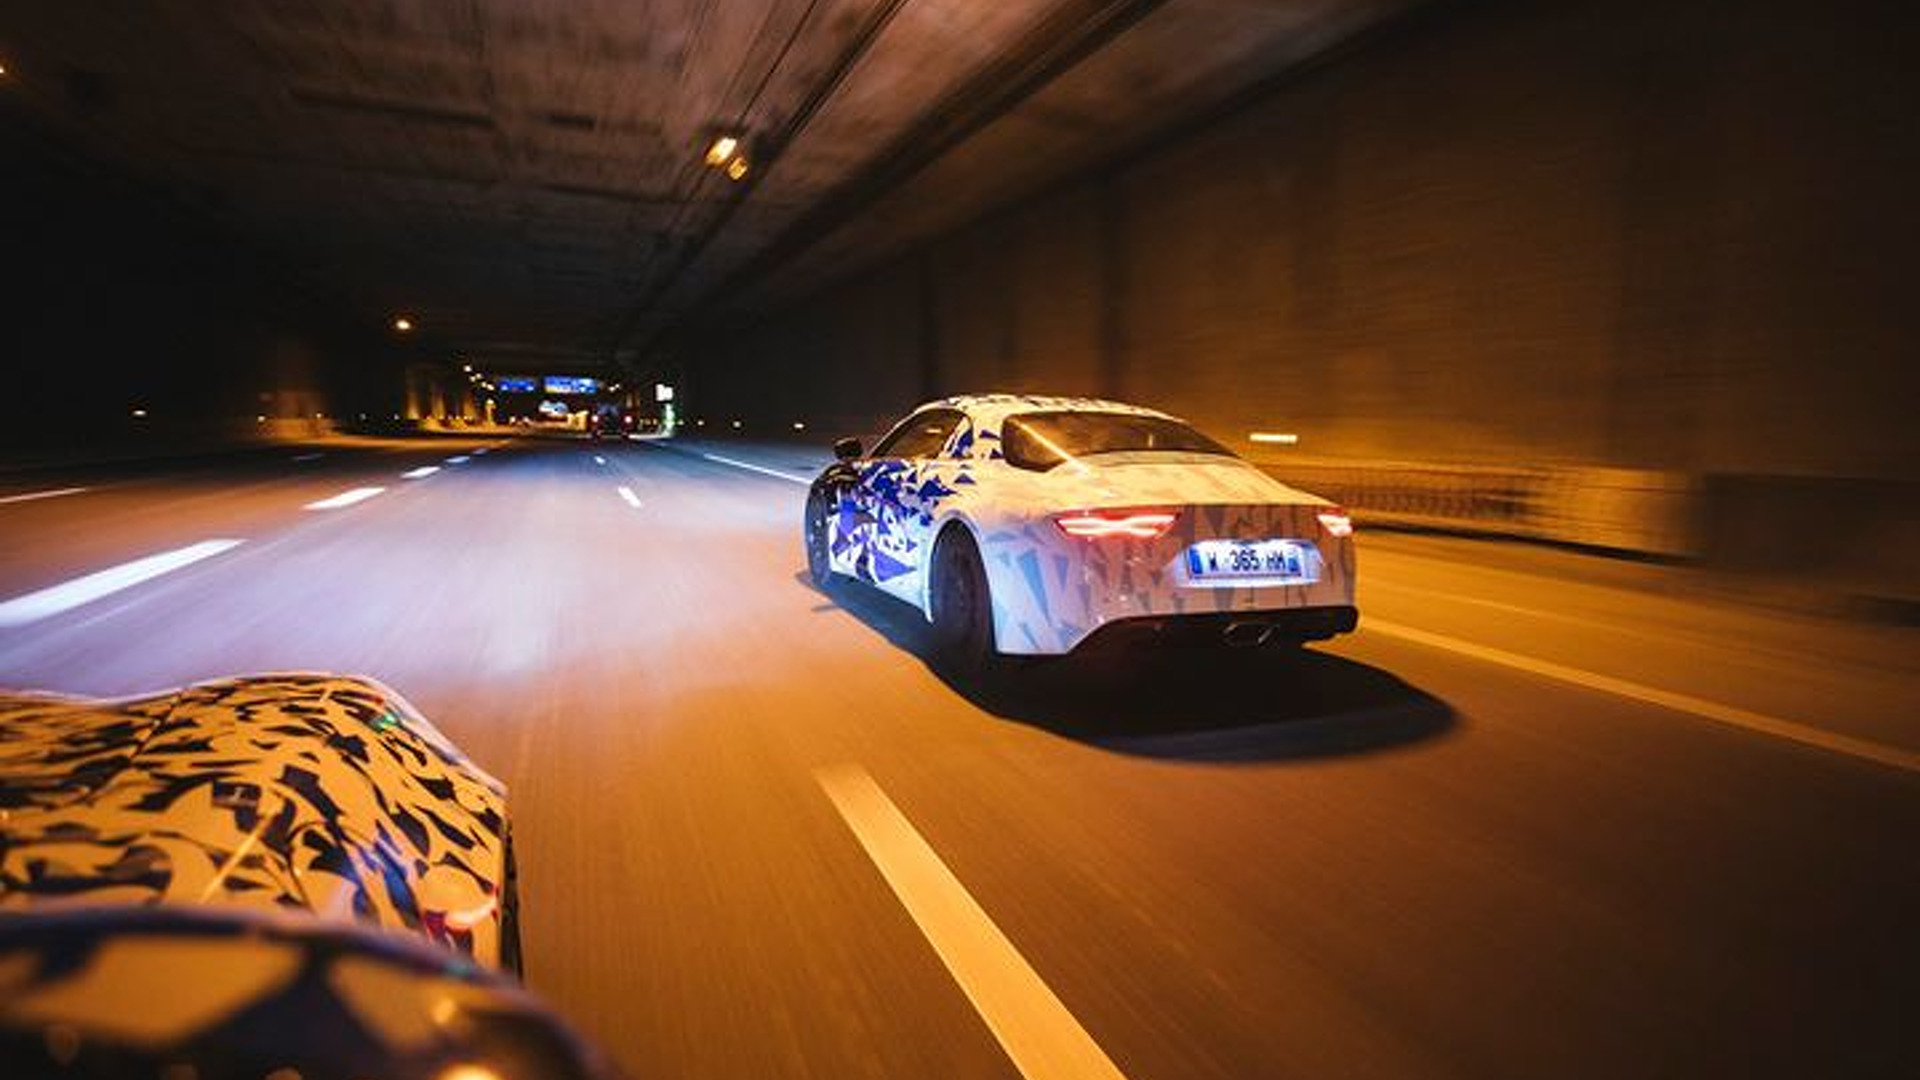 alpine-prototypes-paris-night-ride (2)